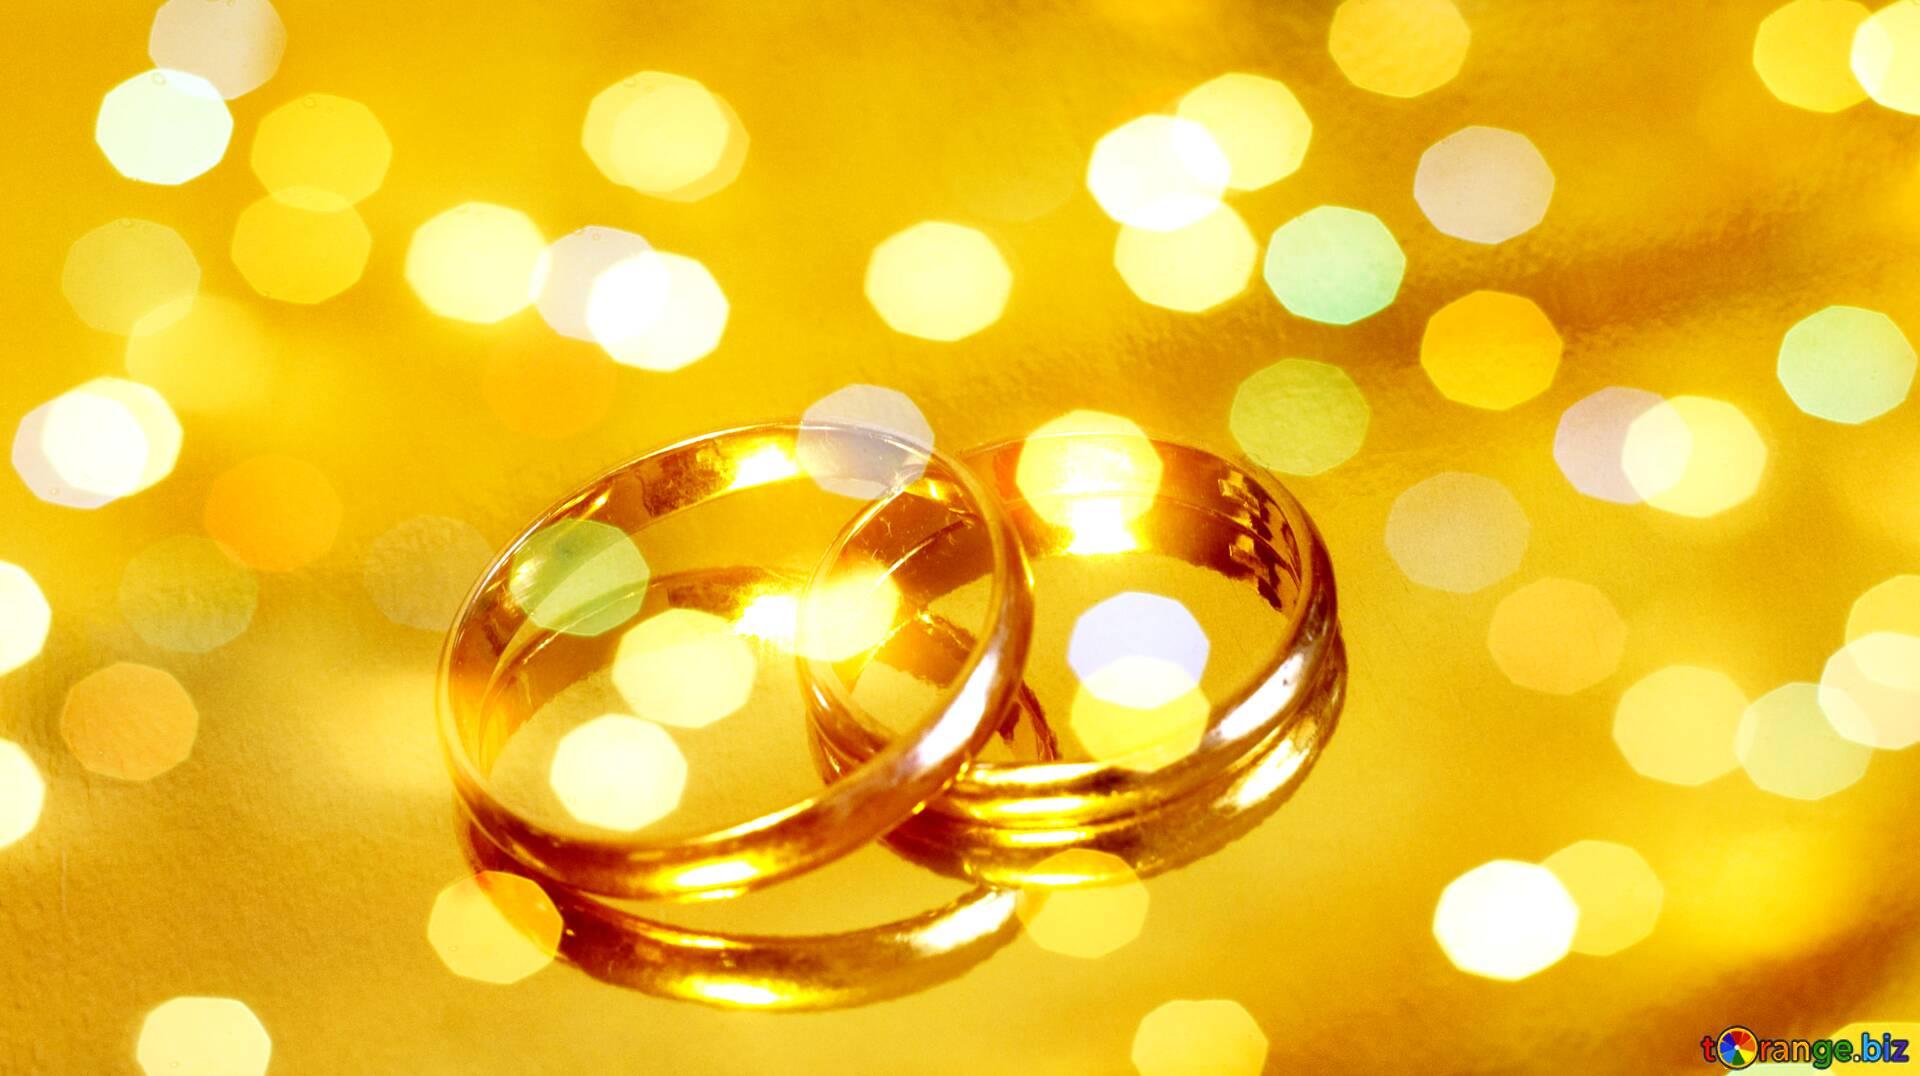 Download Free Picture Wedding Background On Cc By License Free Image Stock Torange Biz Fx 180956